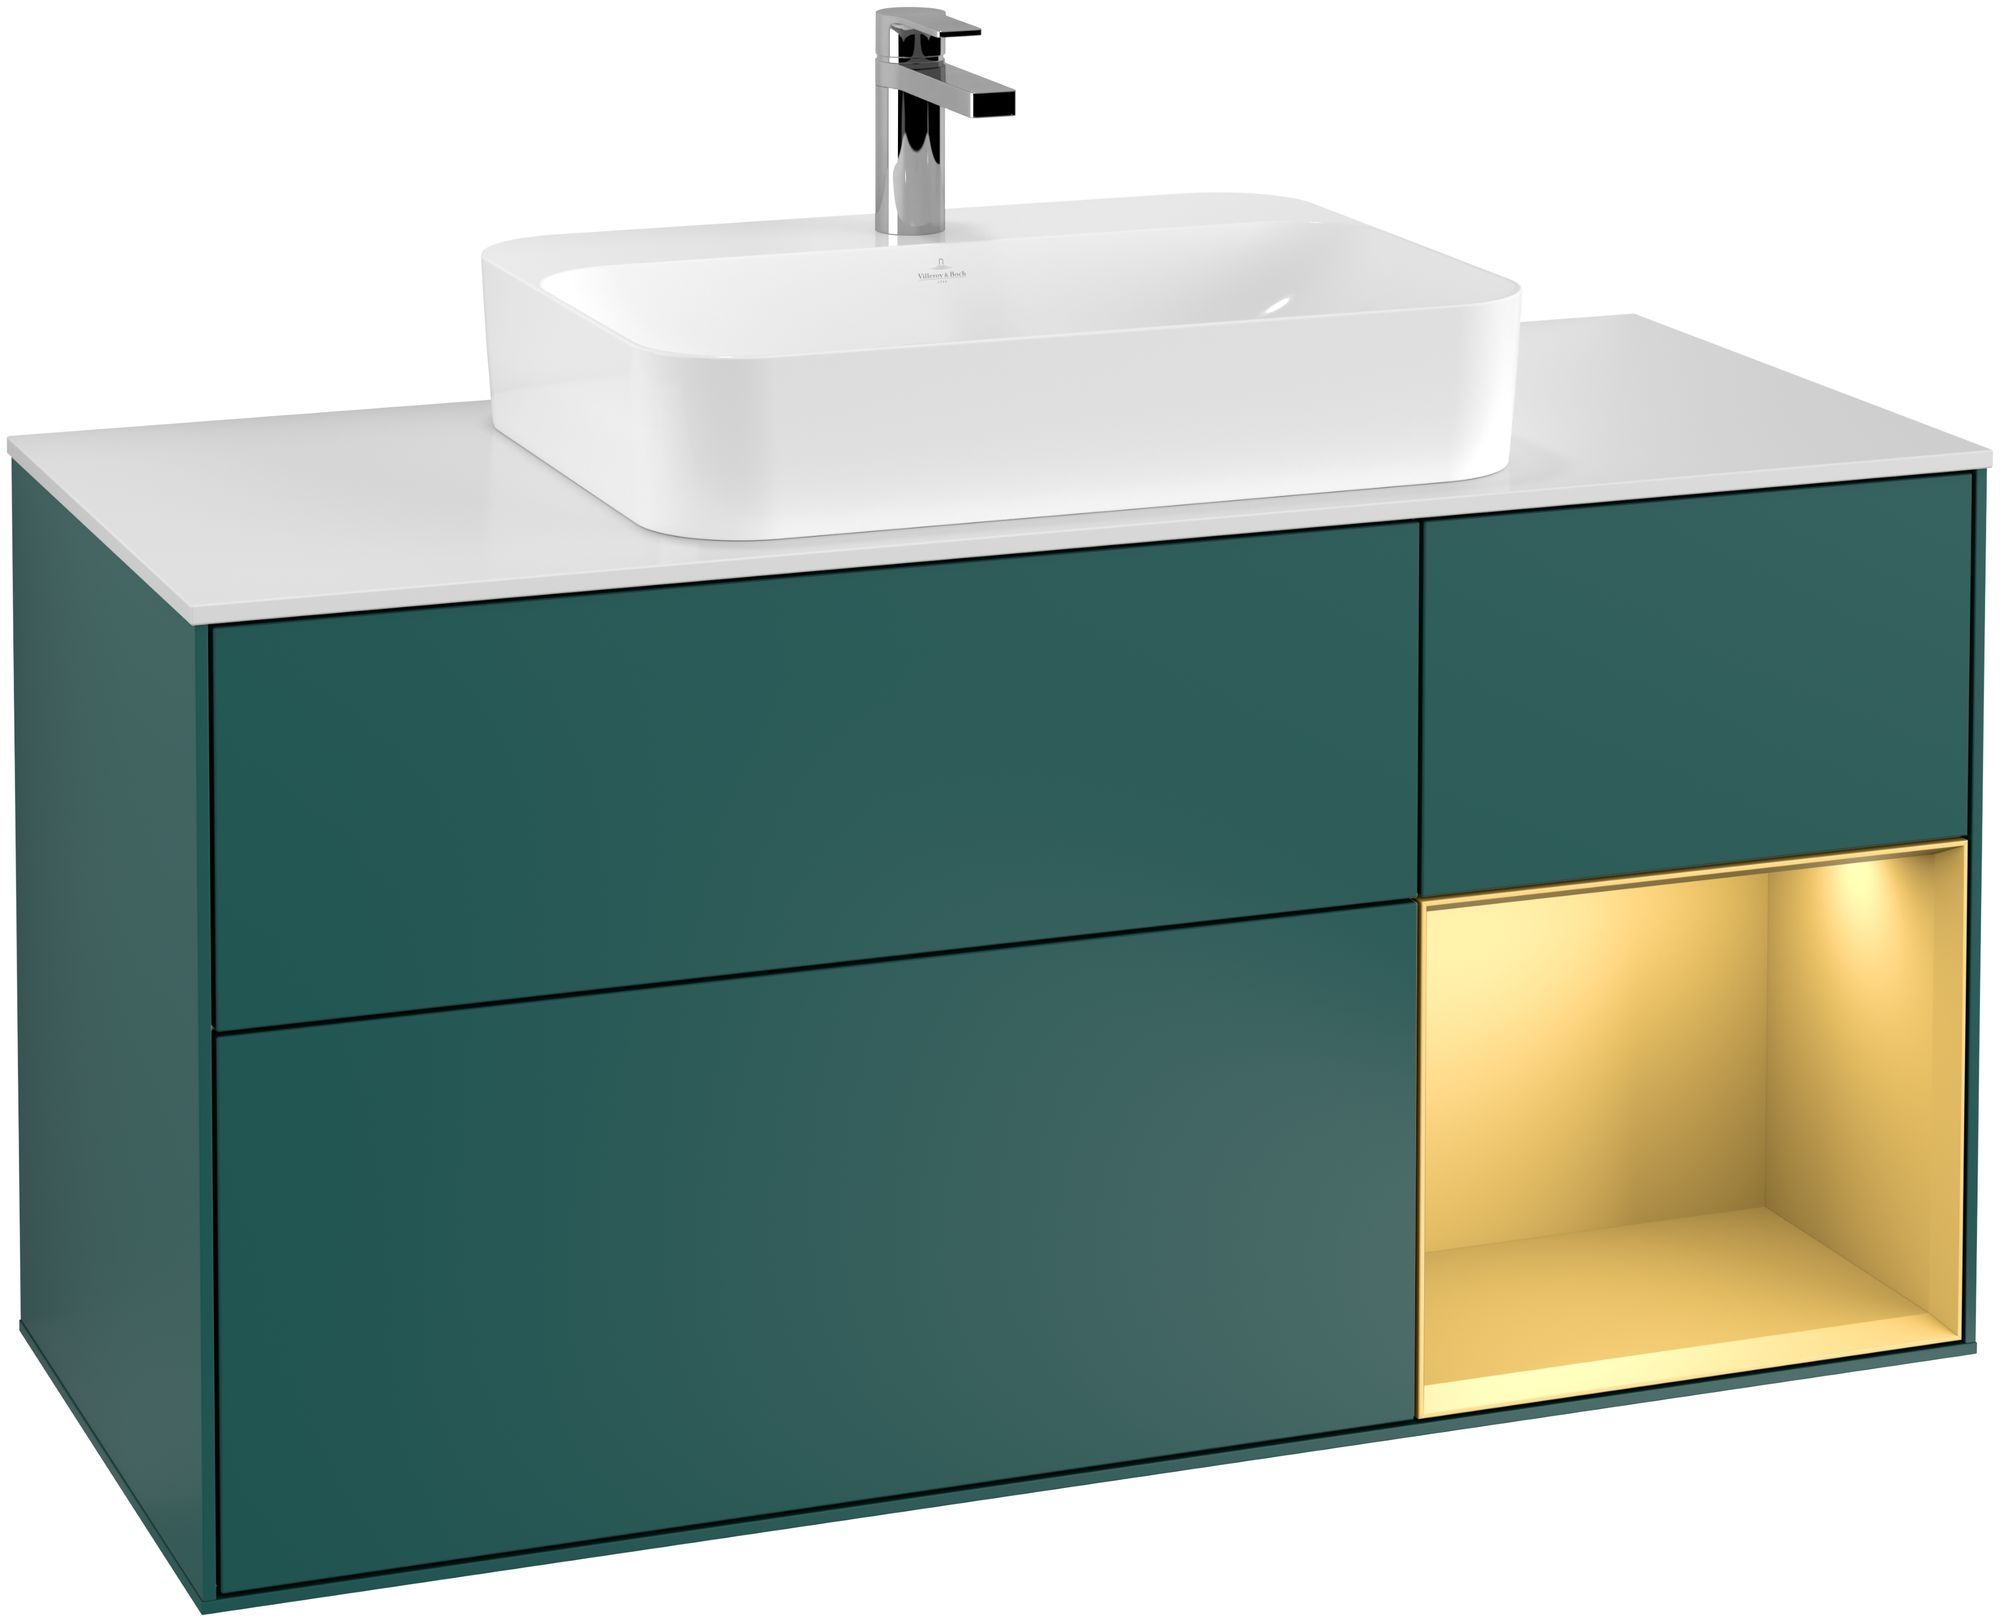 Villeroy & Boch Finion G42 Waschtischunterschrank mit Regalelement 3 Auszüge Waschtisch mittig LED-Beleuchtung B:120xH:60,3xT:50,1cm Front, Korpus: Cedar, Regal: Gold Matt, Glasplatte: White Matt G421HFGS